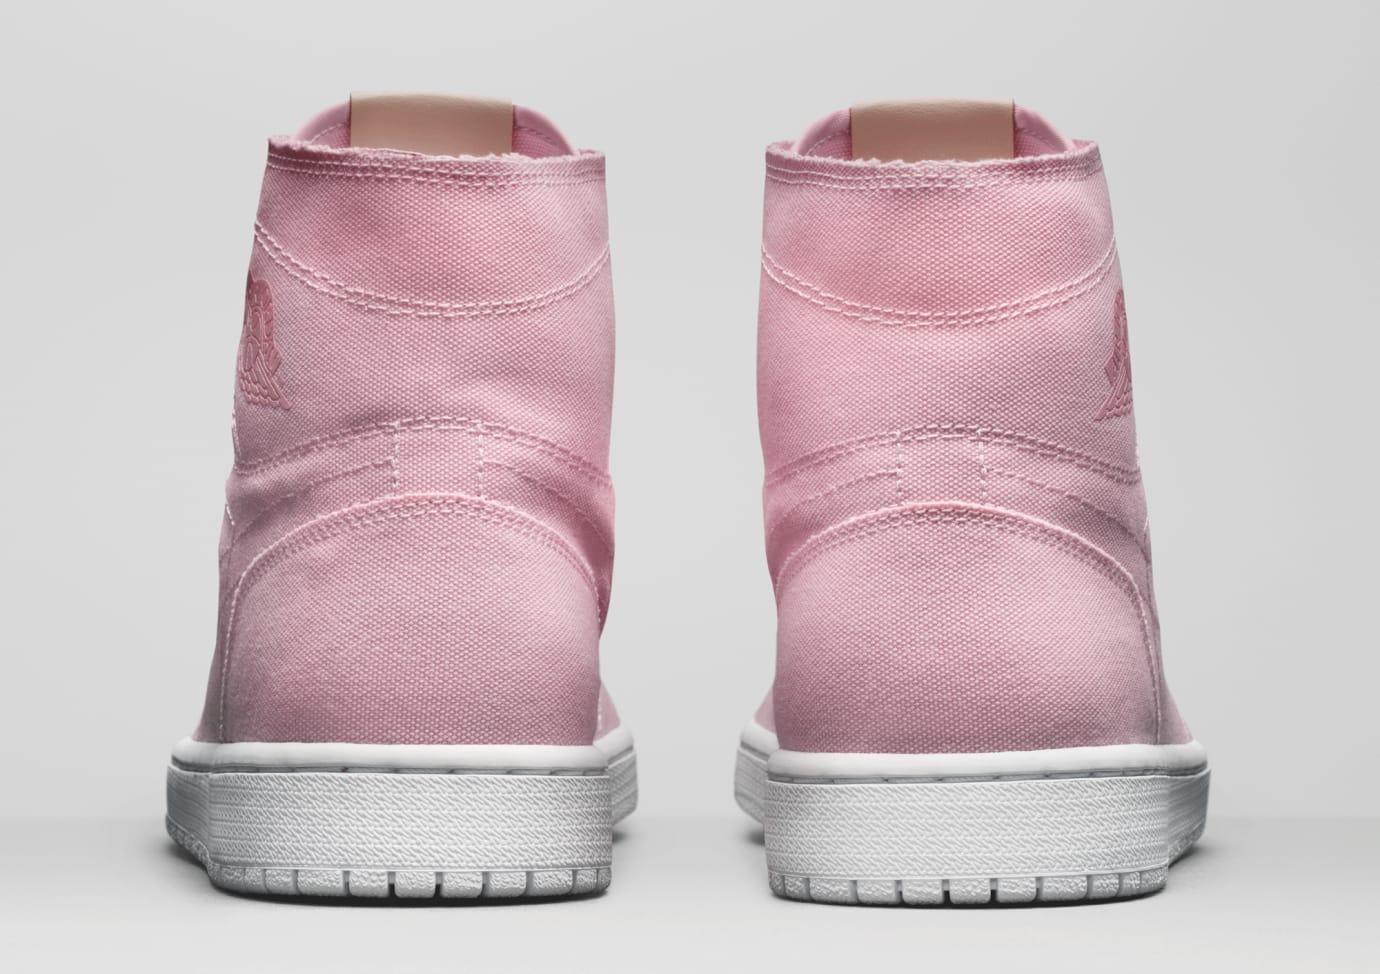 Air Jordan 1 867338-620 Heel